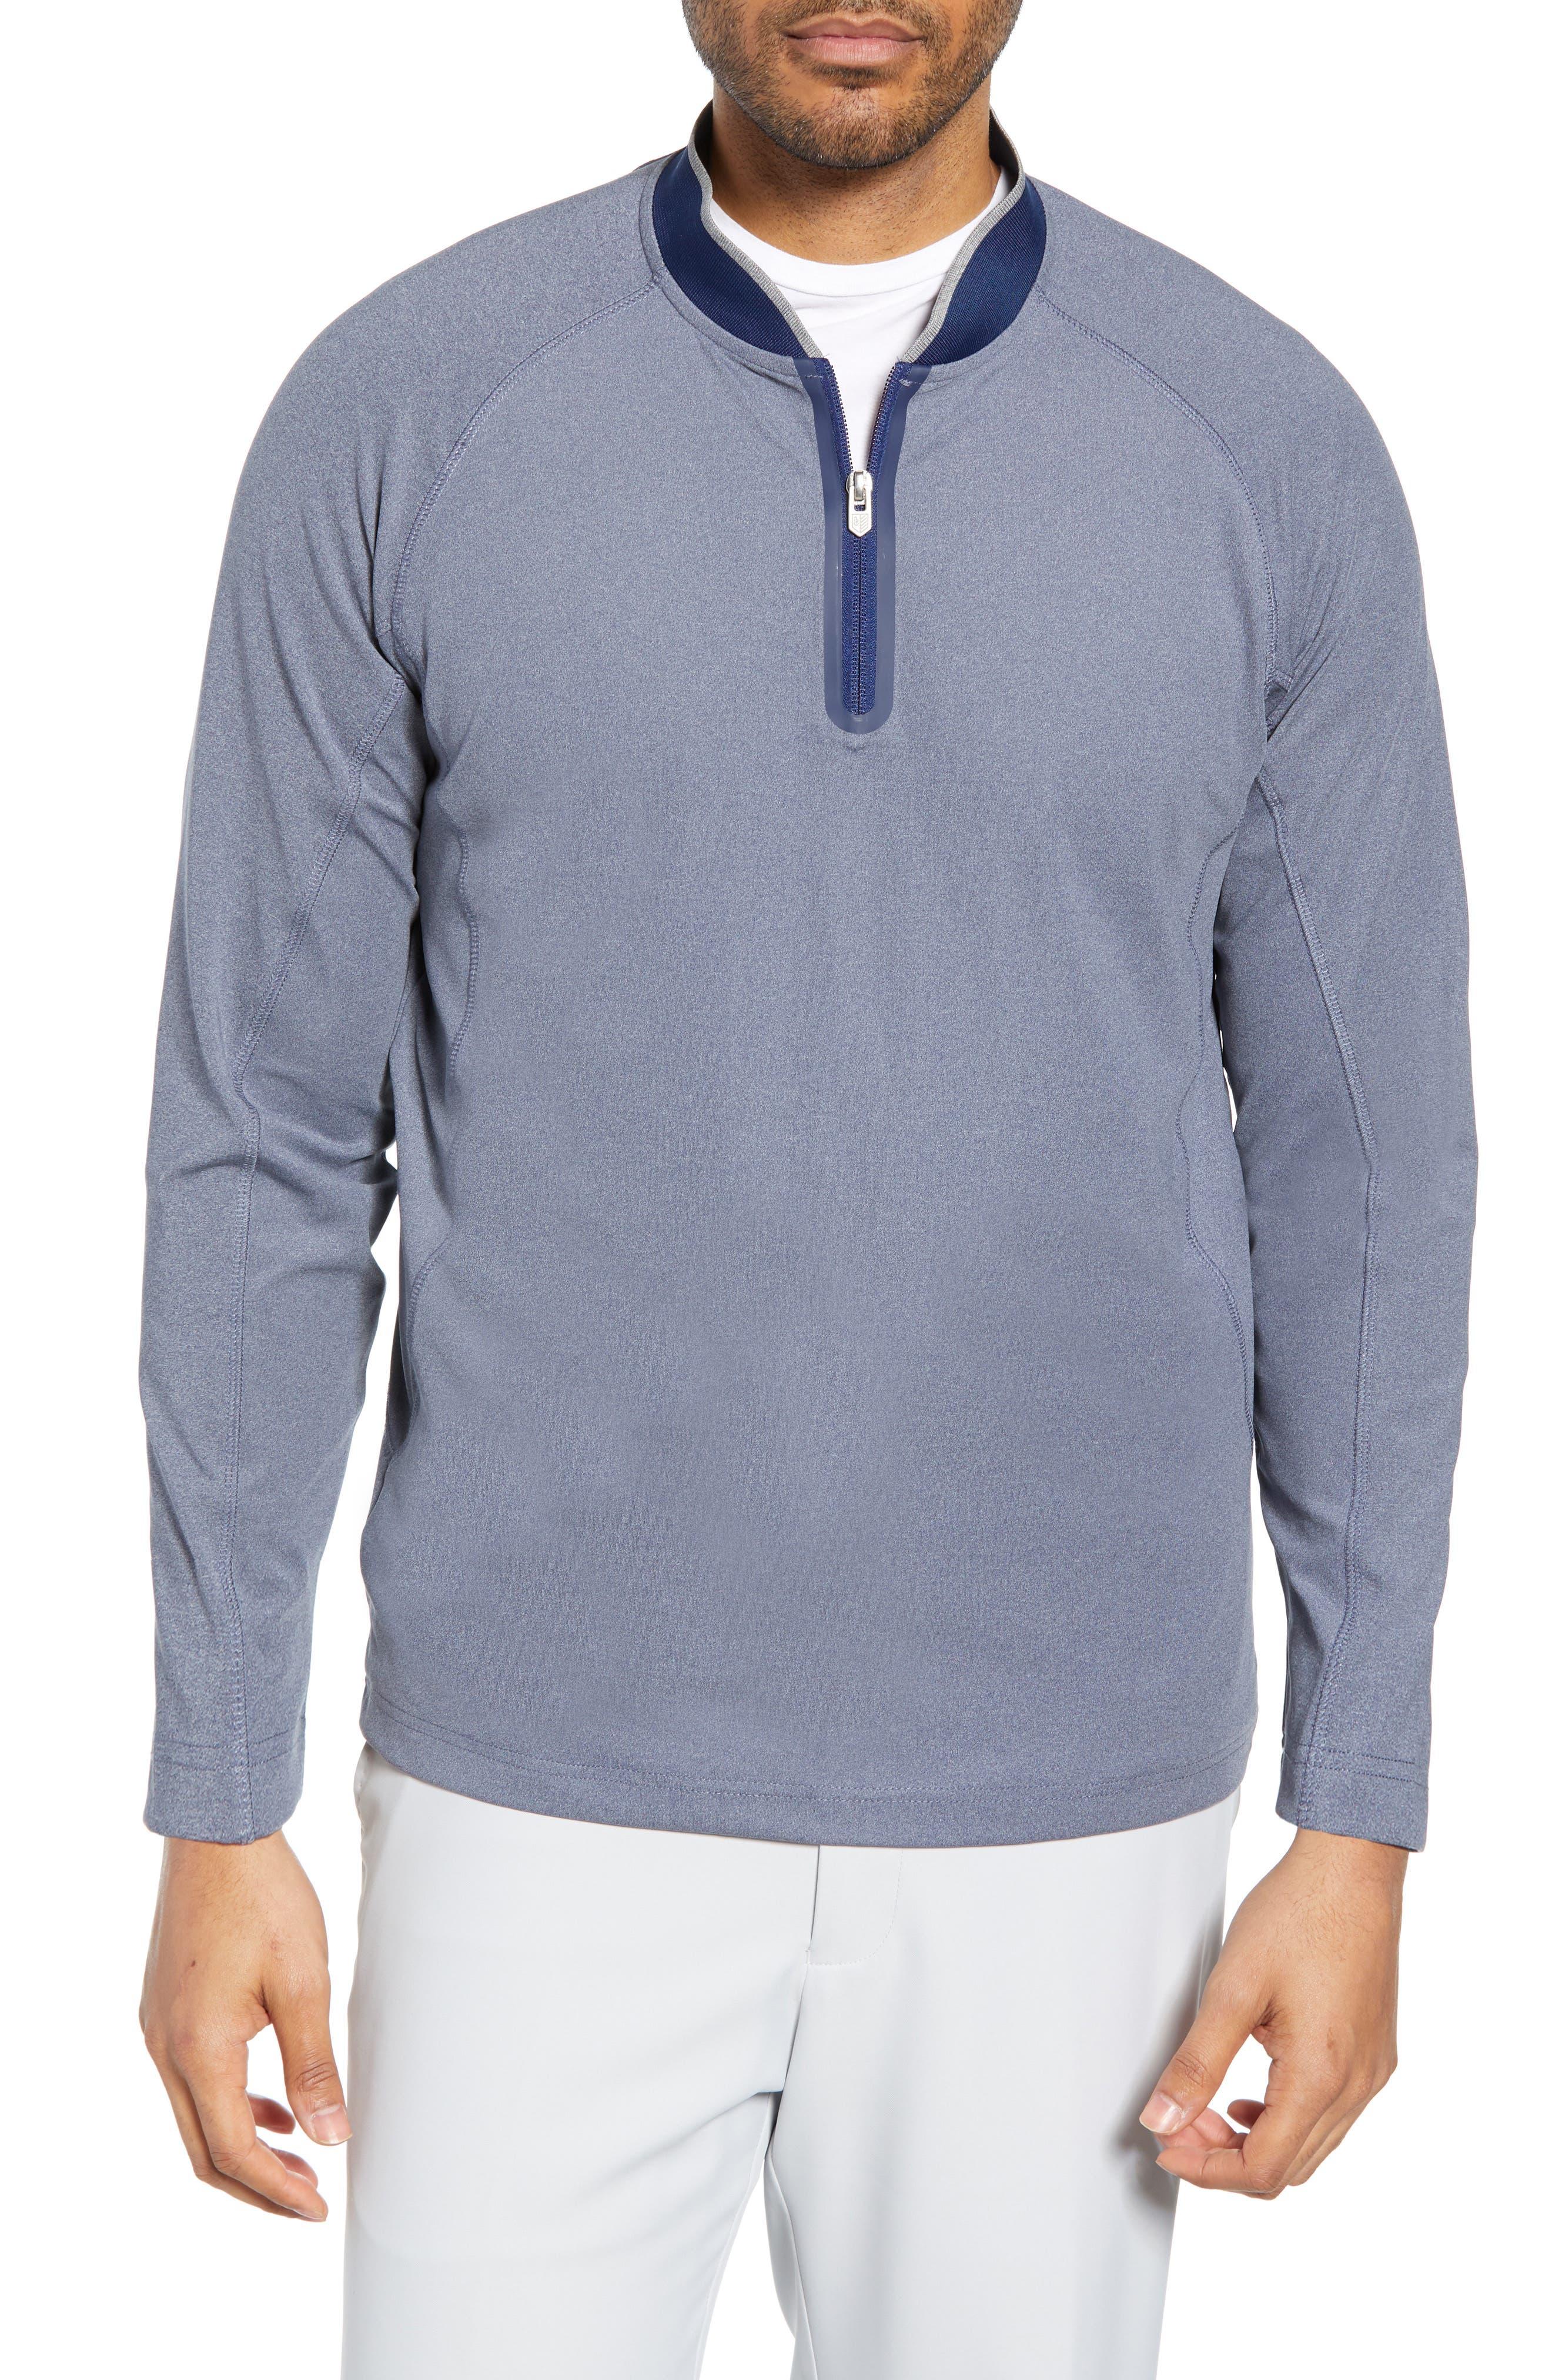 BOBBY JONES, Rule 18 Quarter Zip Tech Pullover, Main thumbnail 1, color, NAVY